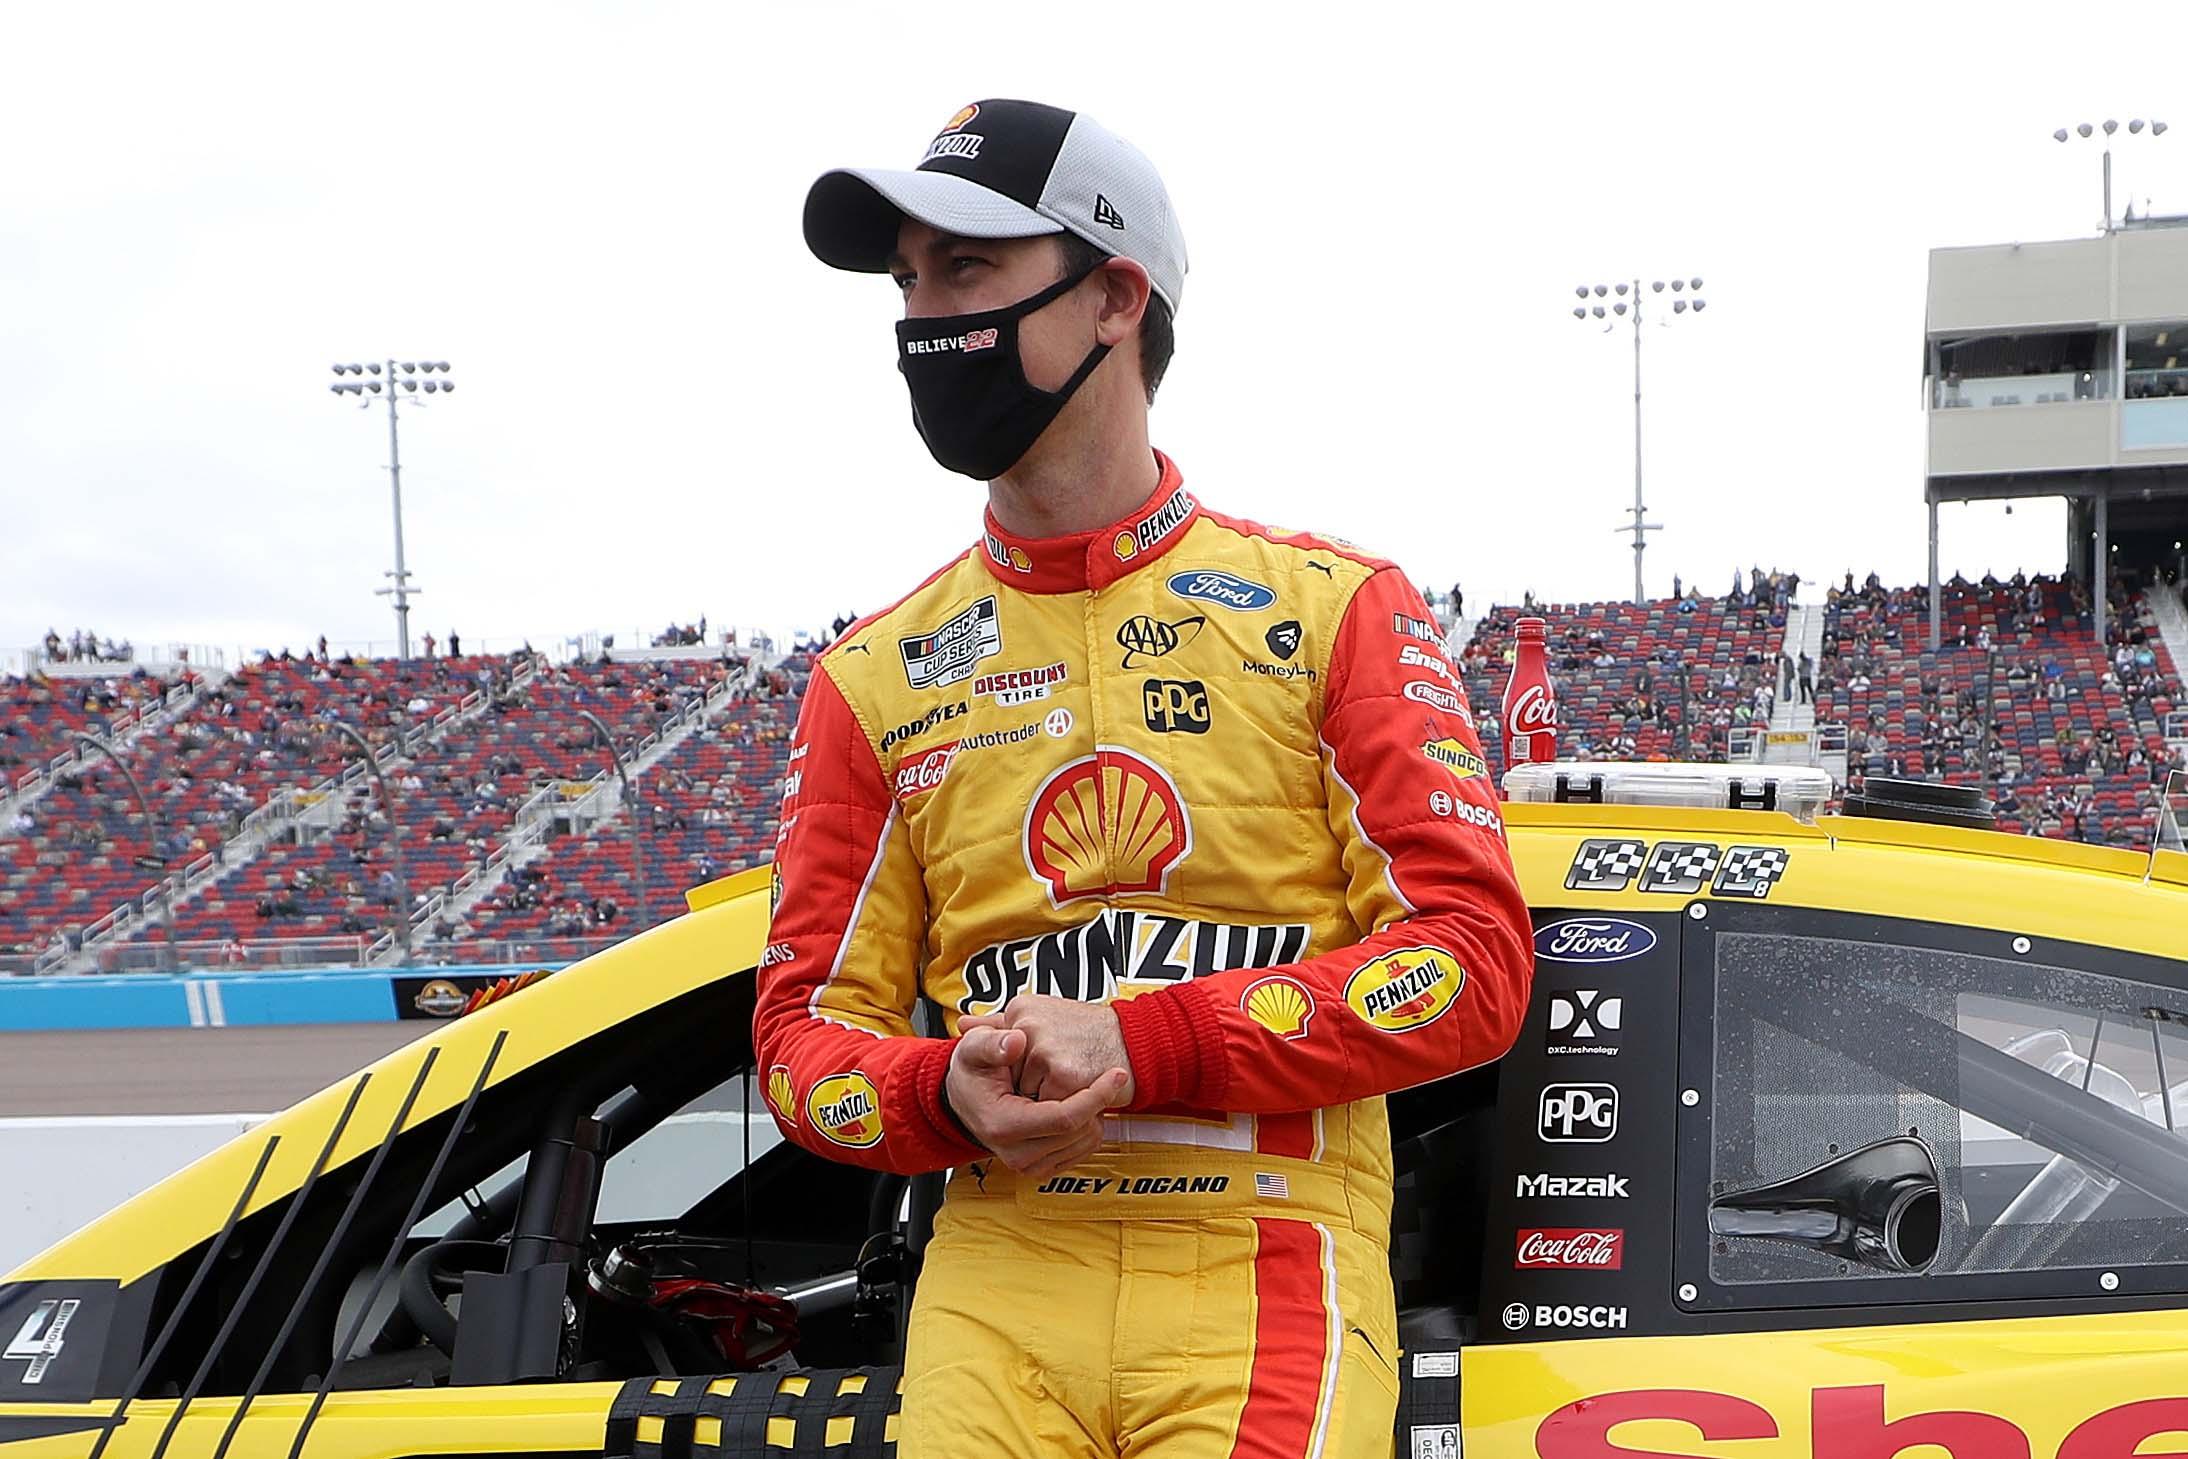 Joey Logano - NASCAR driver